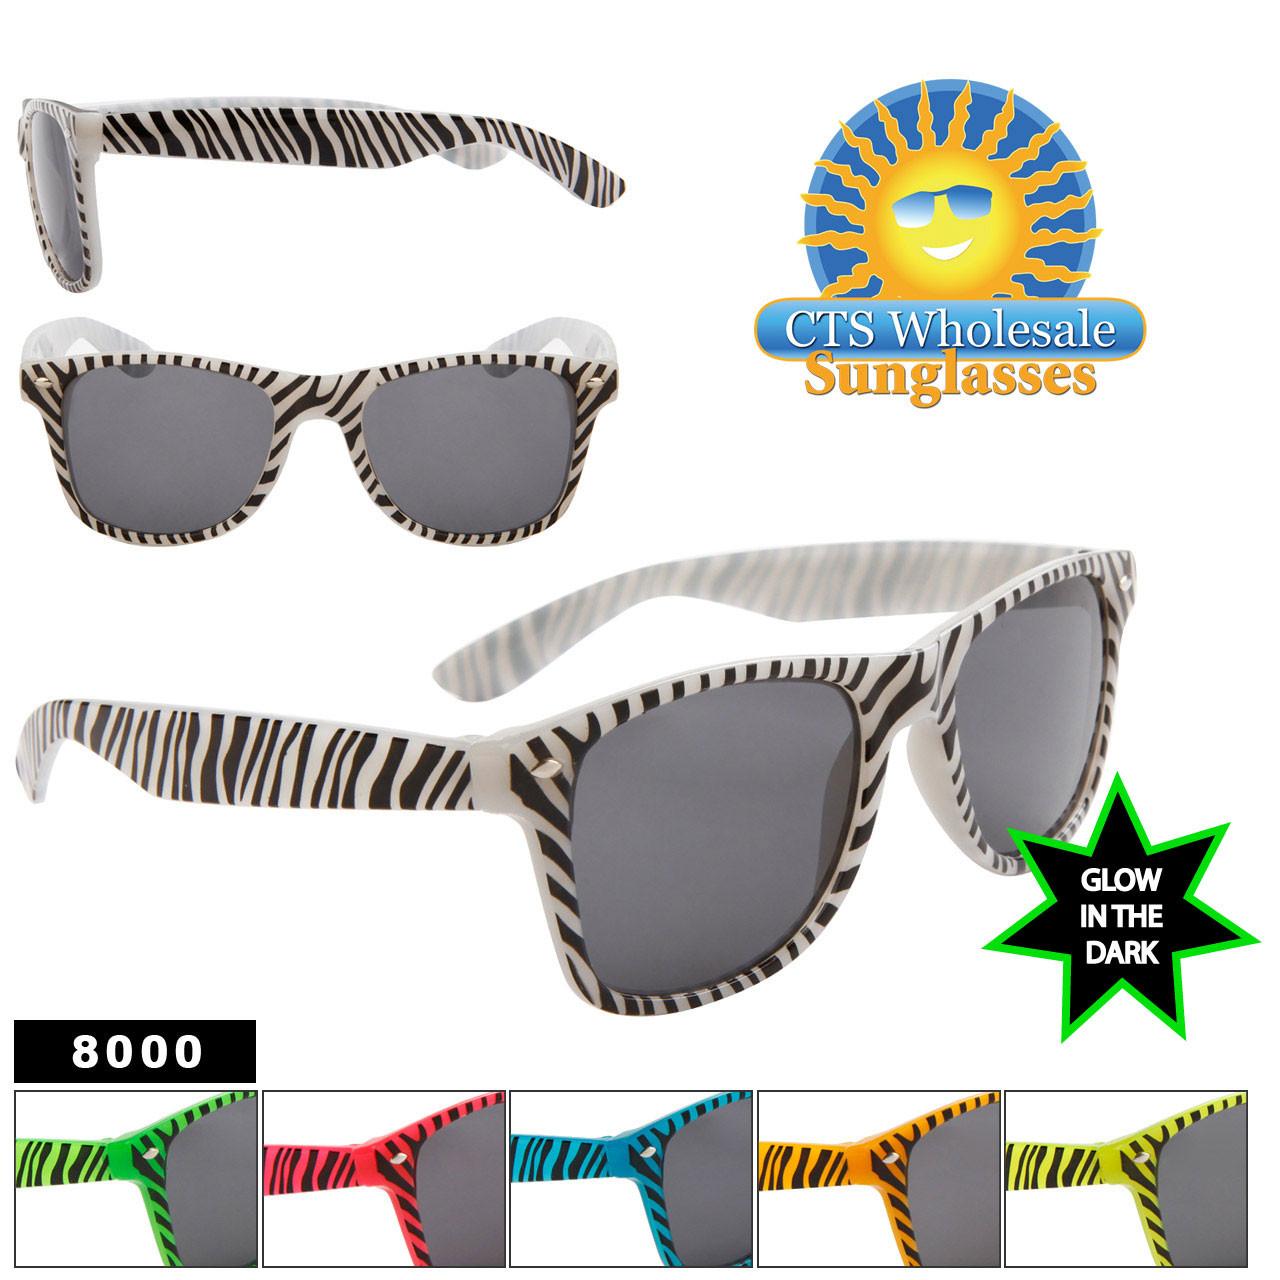 Glow In The Dark Sunglasses #8000